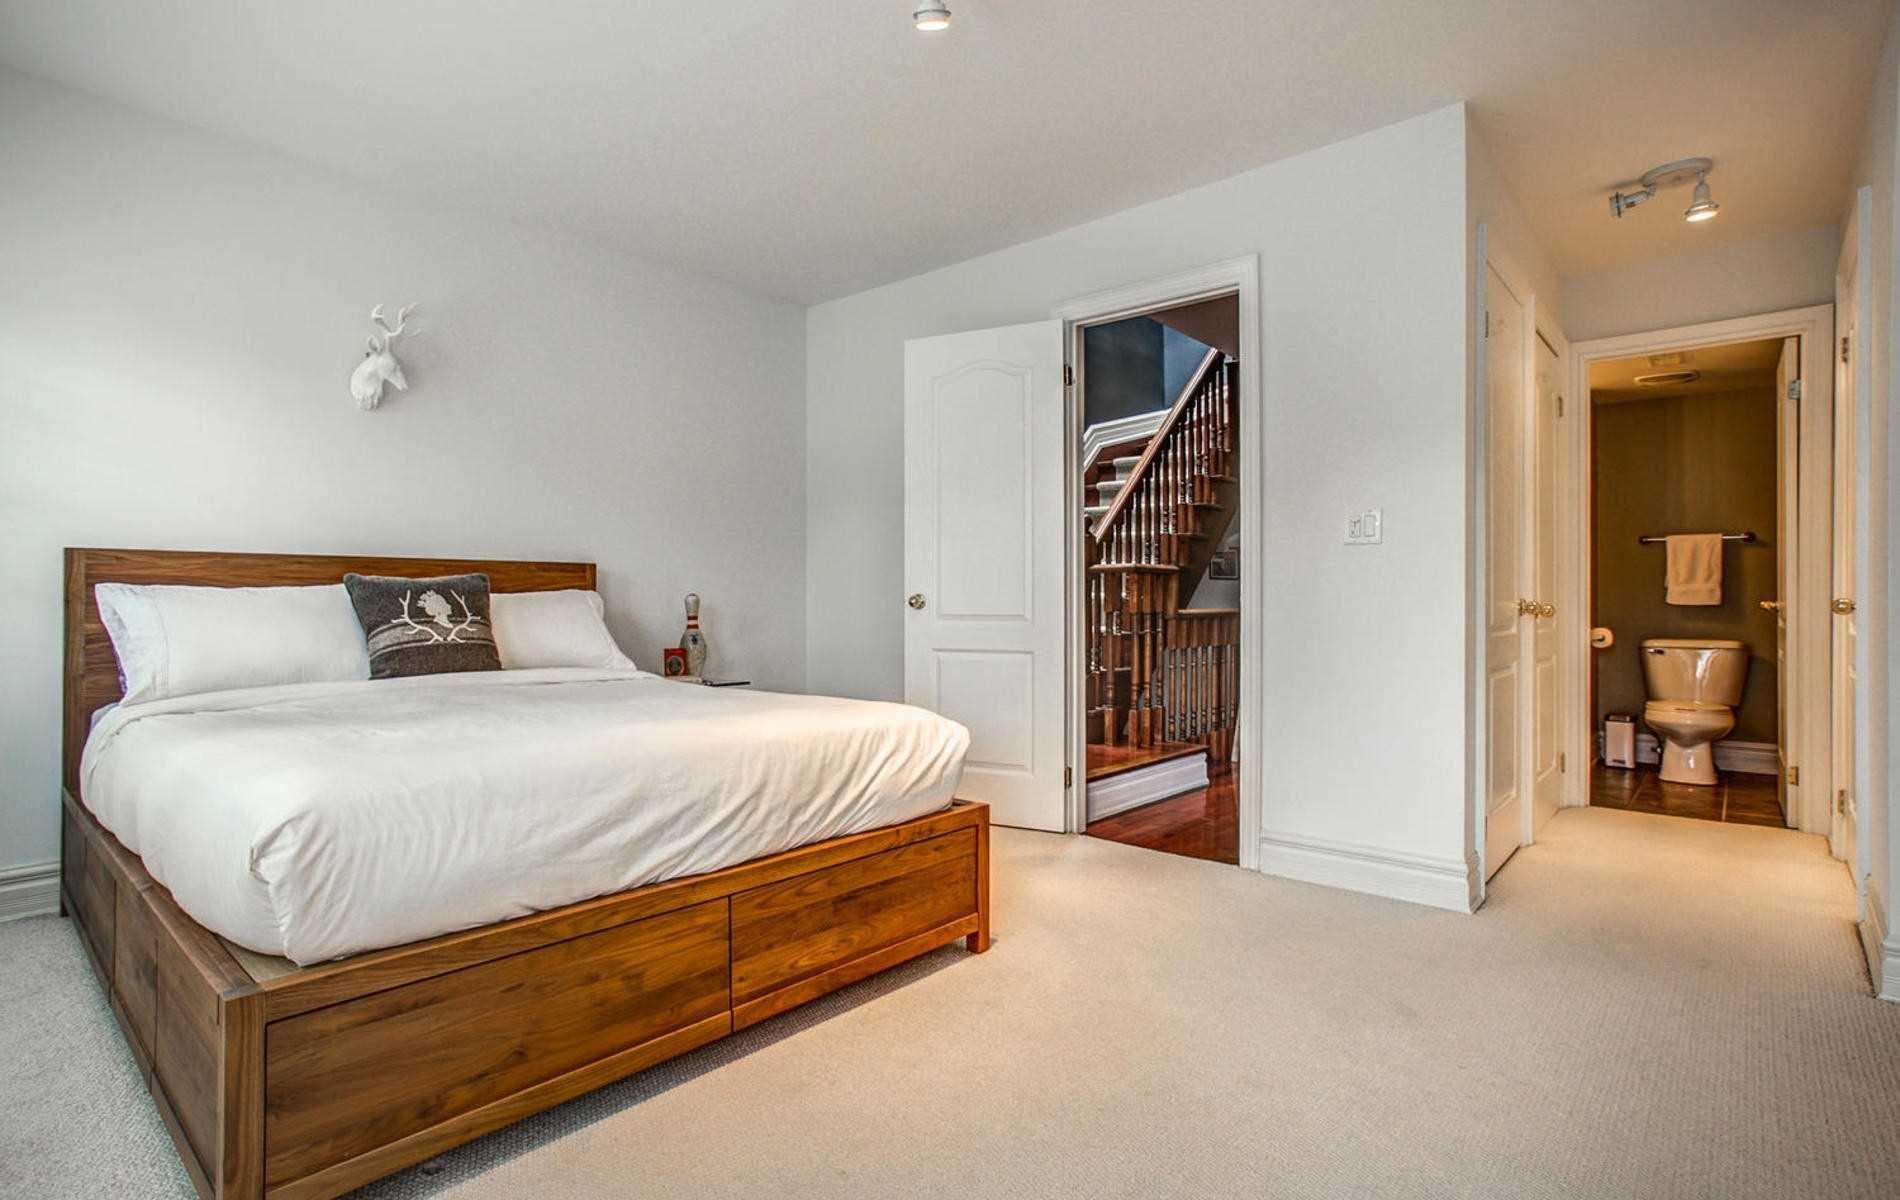 Photo 9: Photos: 119 Carlaw Avenue in Toronto: South Riverdale House (3-Storey) for lease (Toronto E01)  : MLS®# E4386176